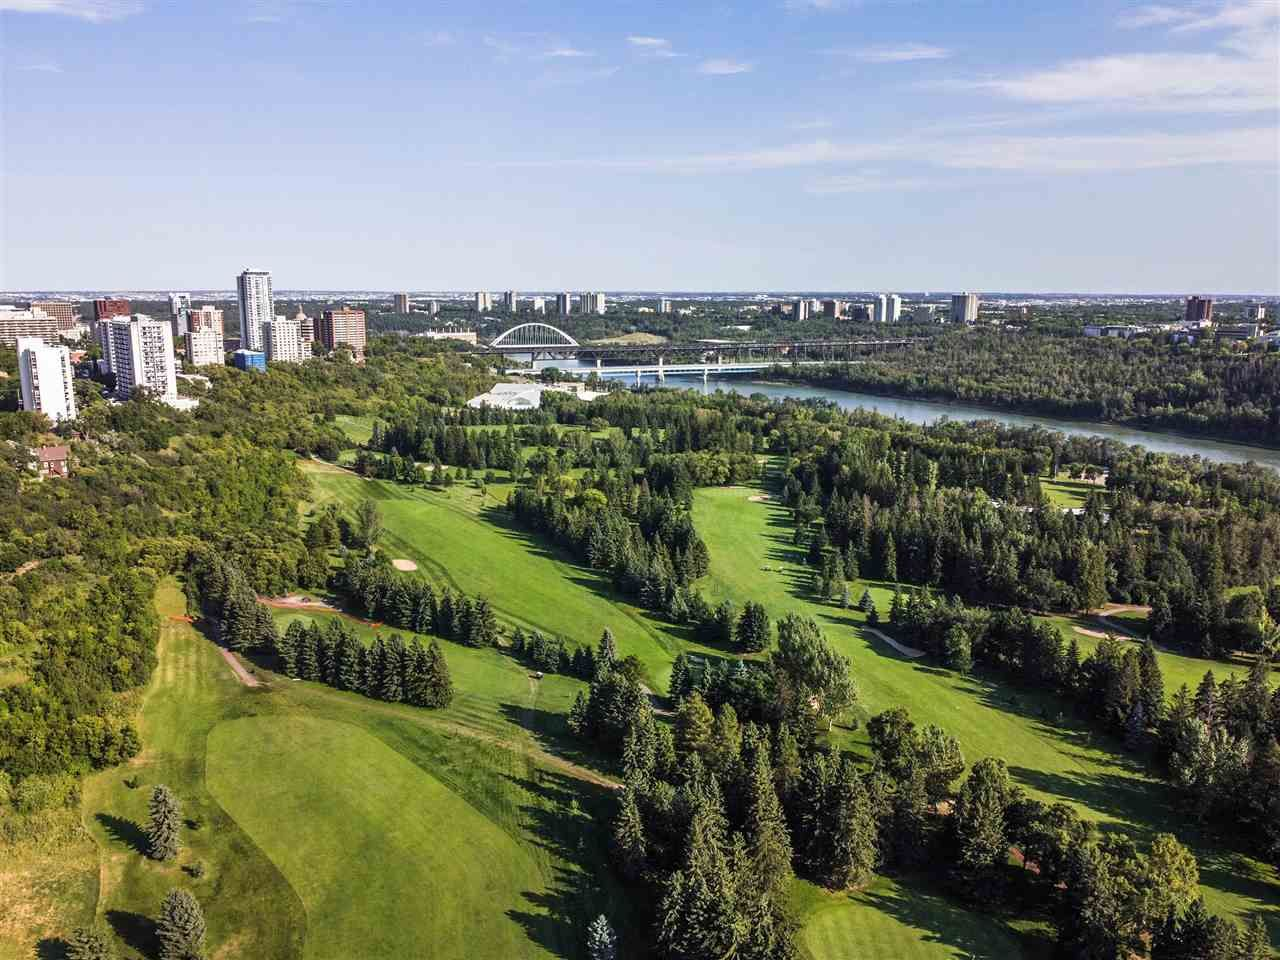 Photo 49: Photos: 1703 11920 100 Avenue in Edmonton: Zone 12 Condo for sale : MLS®# E4233731